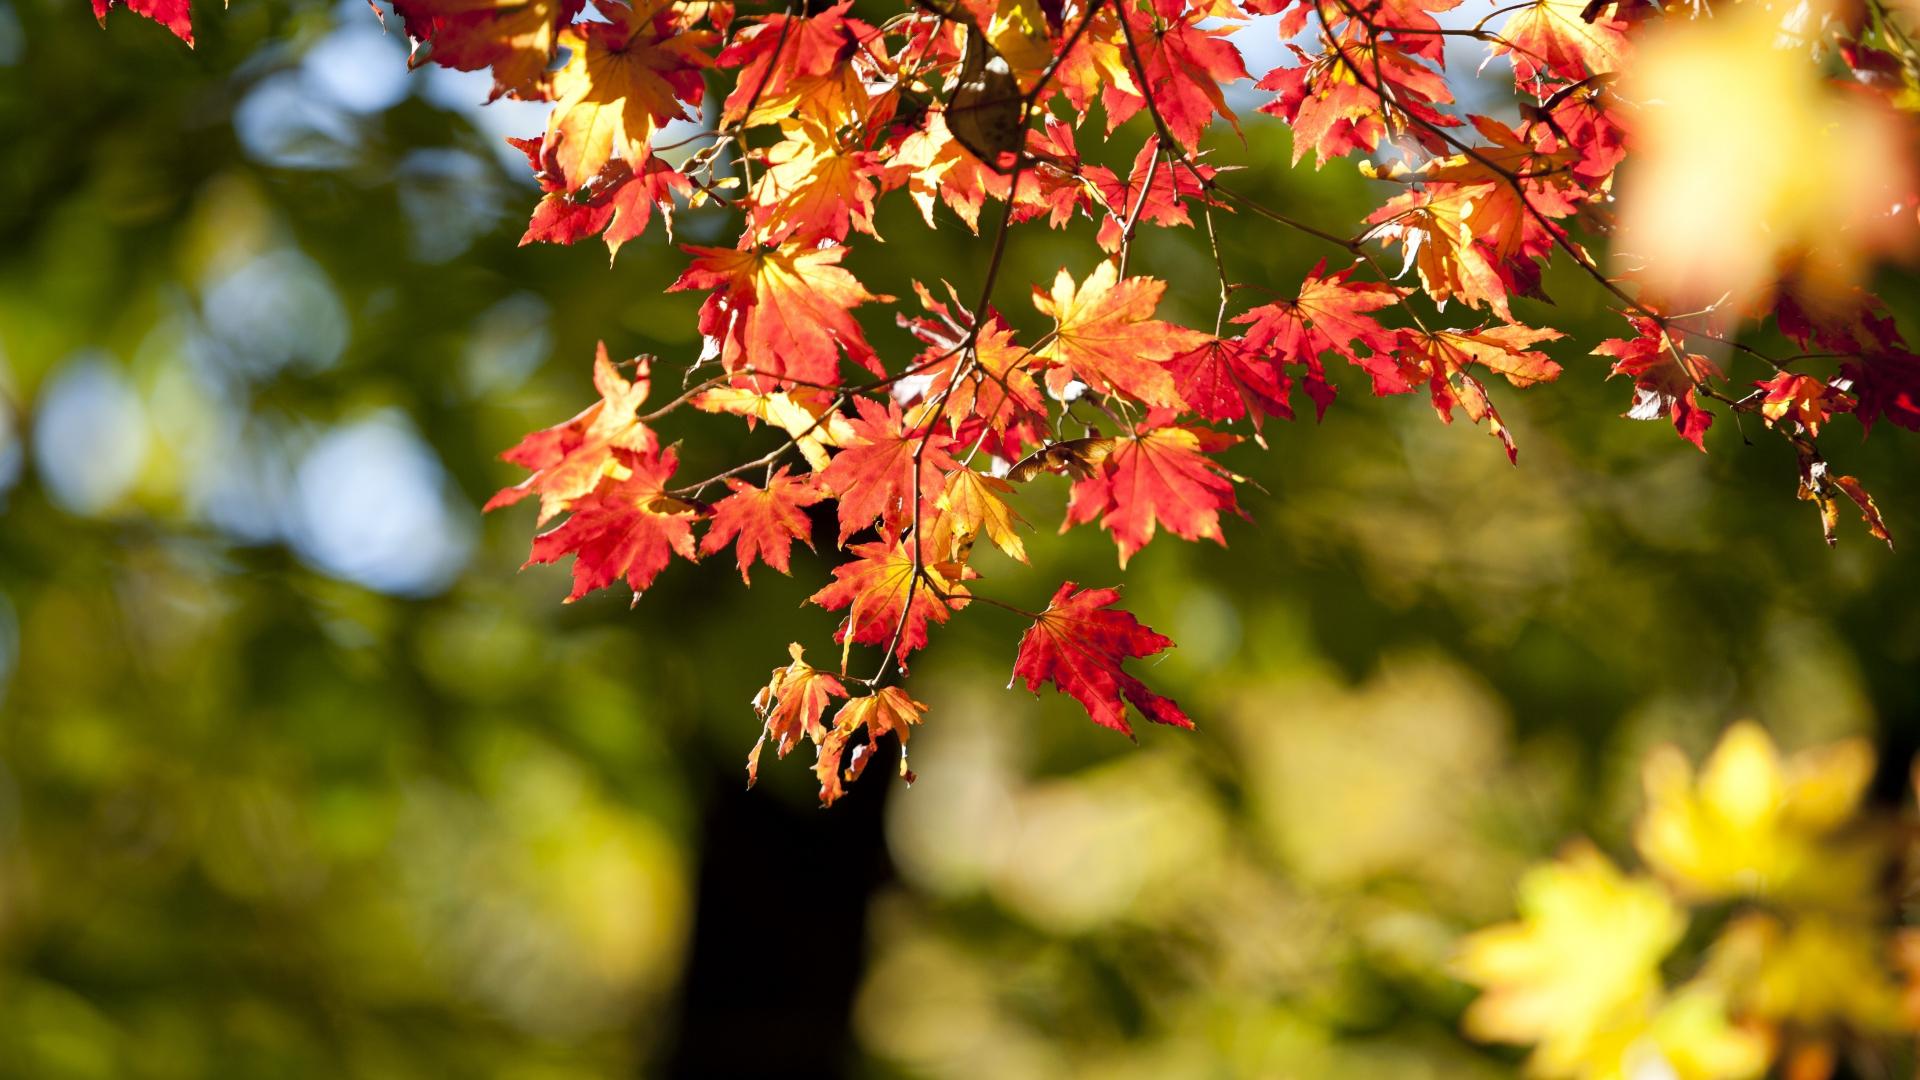 Download 1920x1080 Wallpaper Autumn Nature Leaves Bokeh